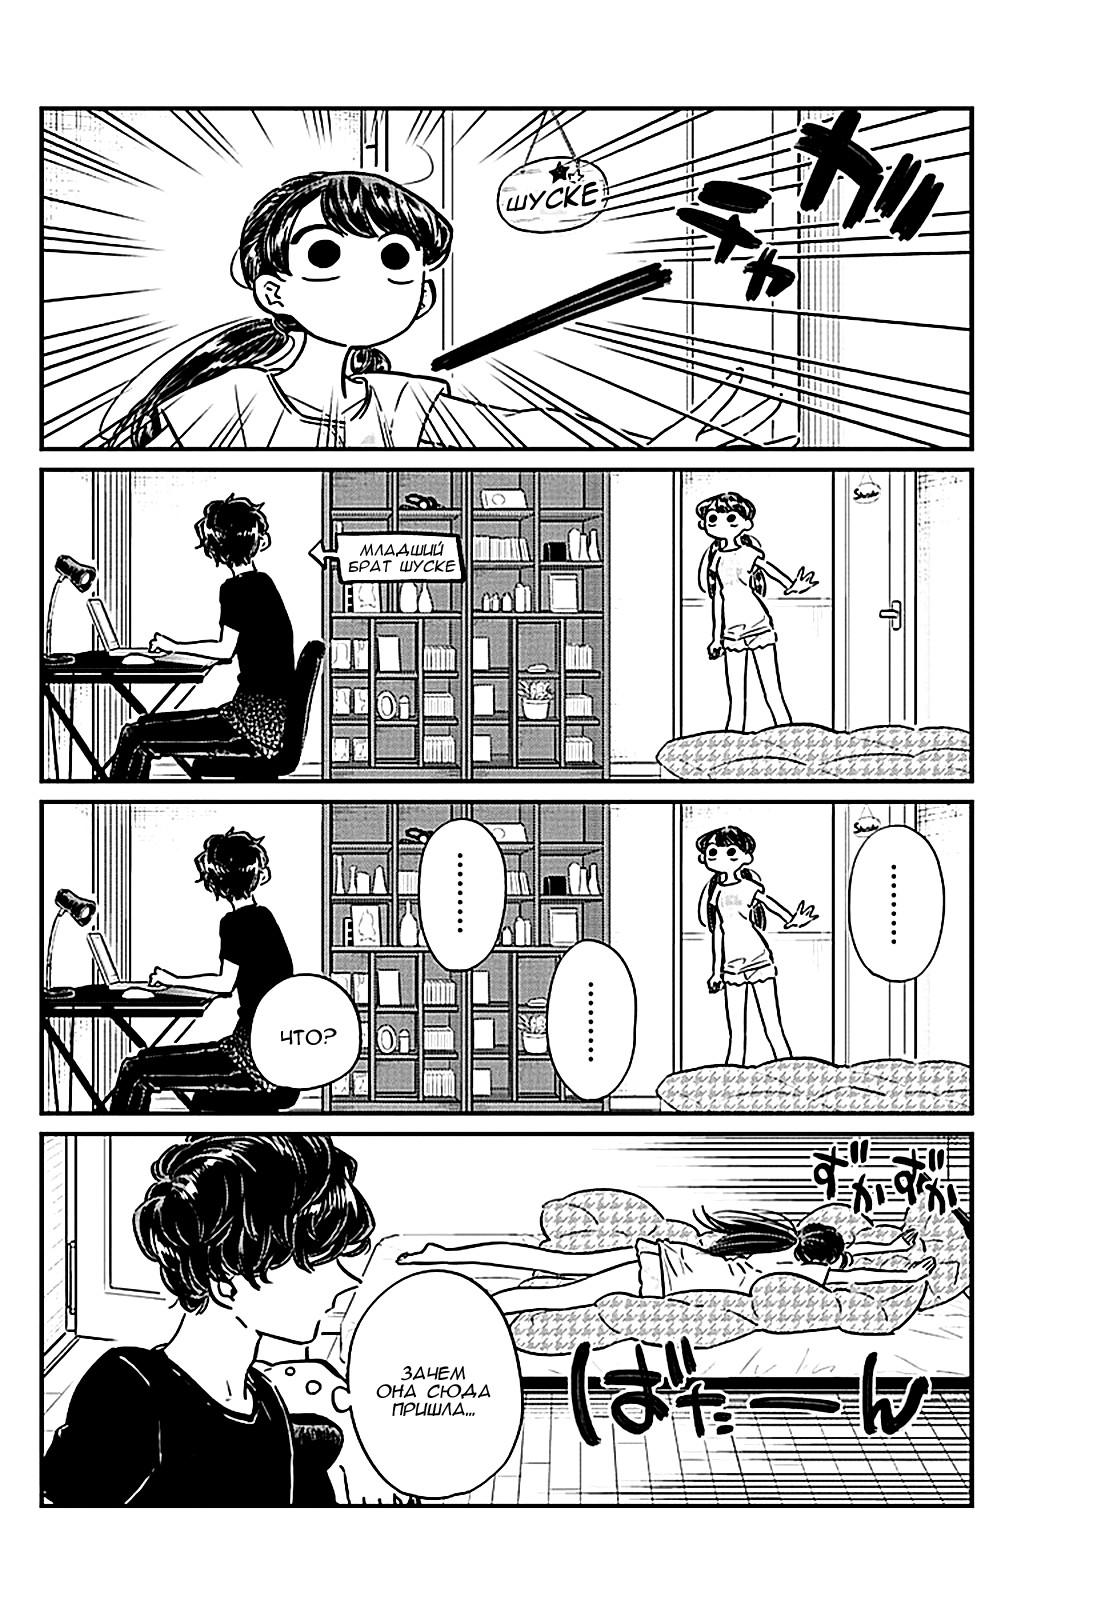 https://r1.ninemanga.com/comics/pic2/12/27788/410132/1520071936359.jpg Page 8